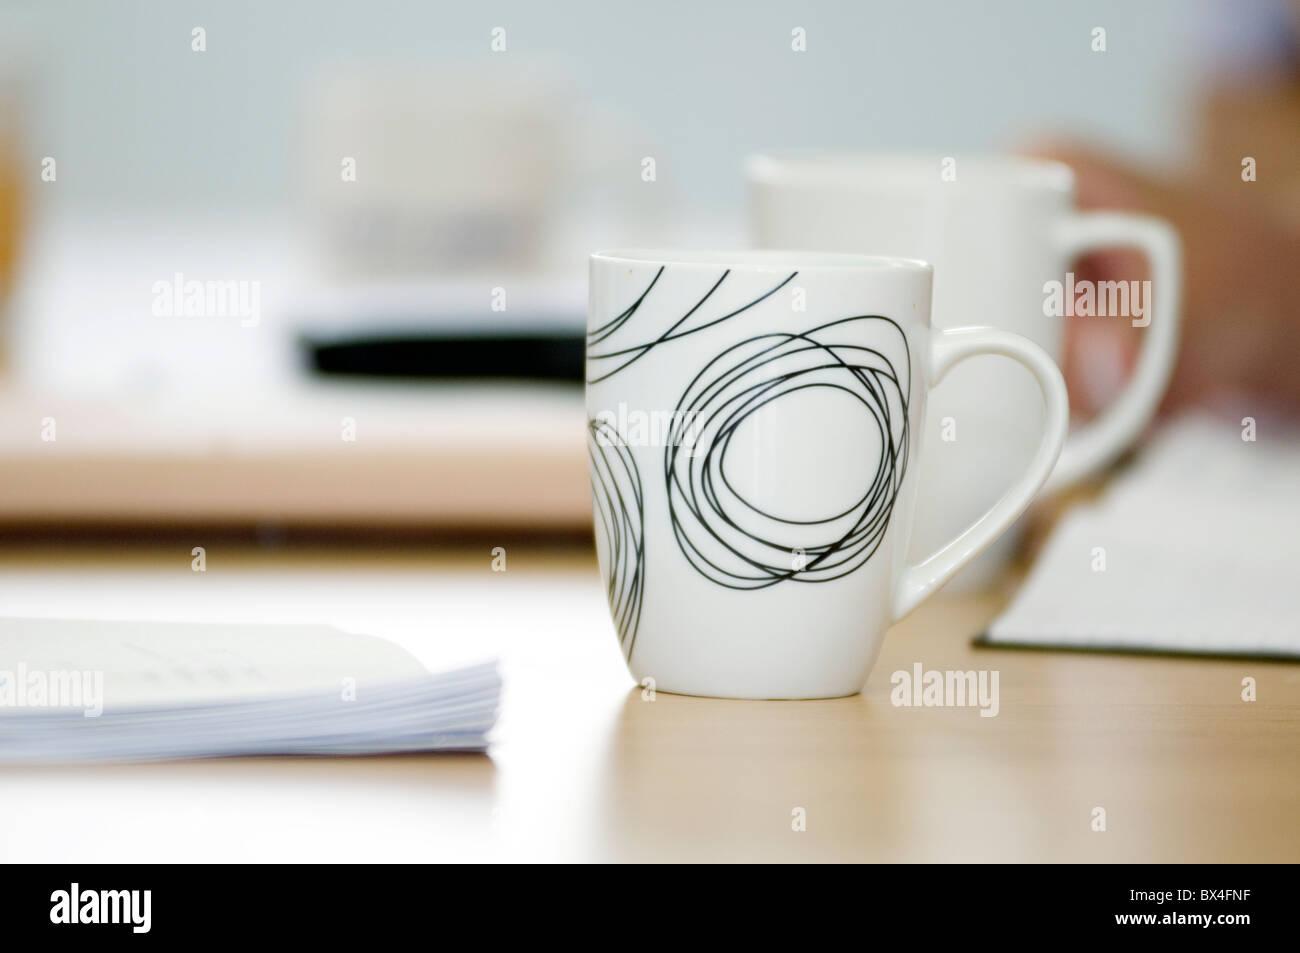 coffee mug mugs cups cup break tea refreshments business meeting drink drinks drinking breaks work at work working - Stock Image